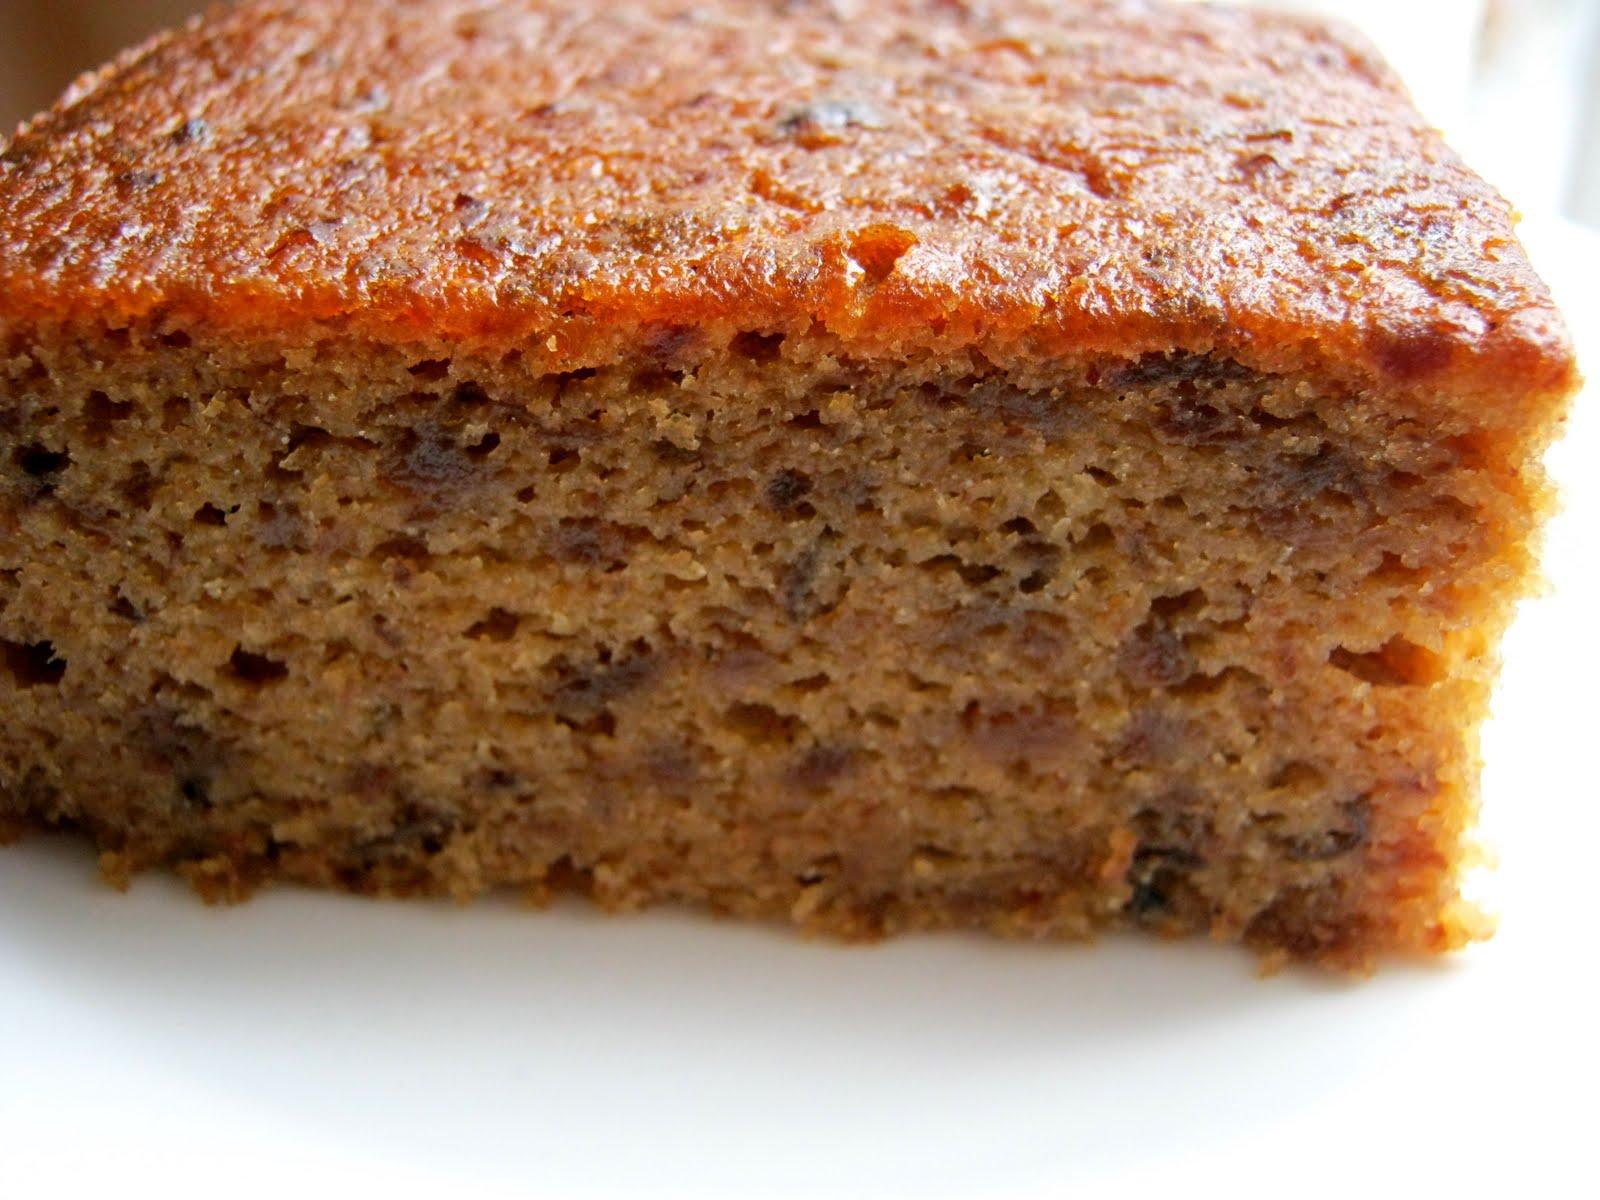 Fruit Cake Recipe Uk Easy: Light Fruit Cake Recipe Uk